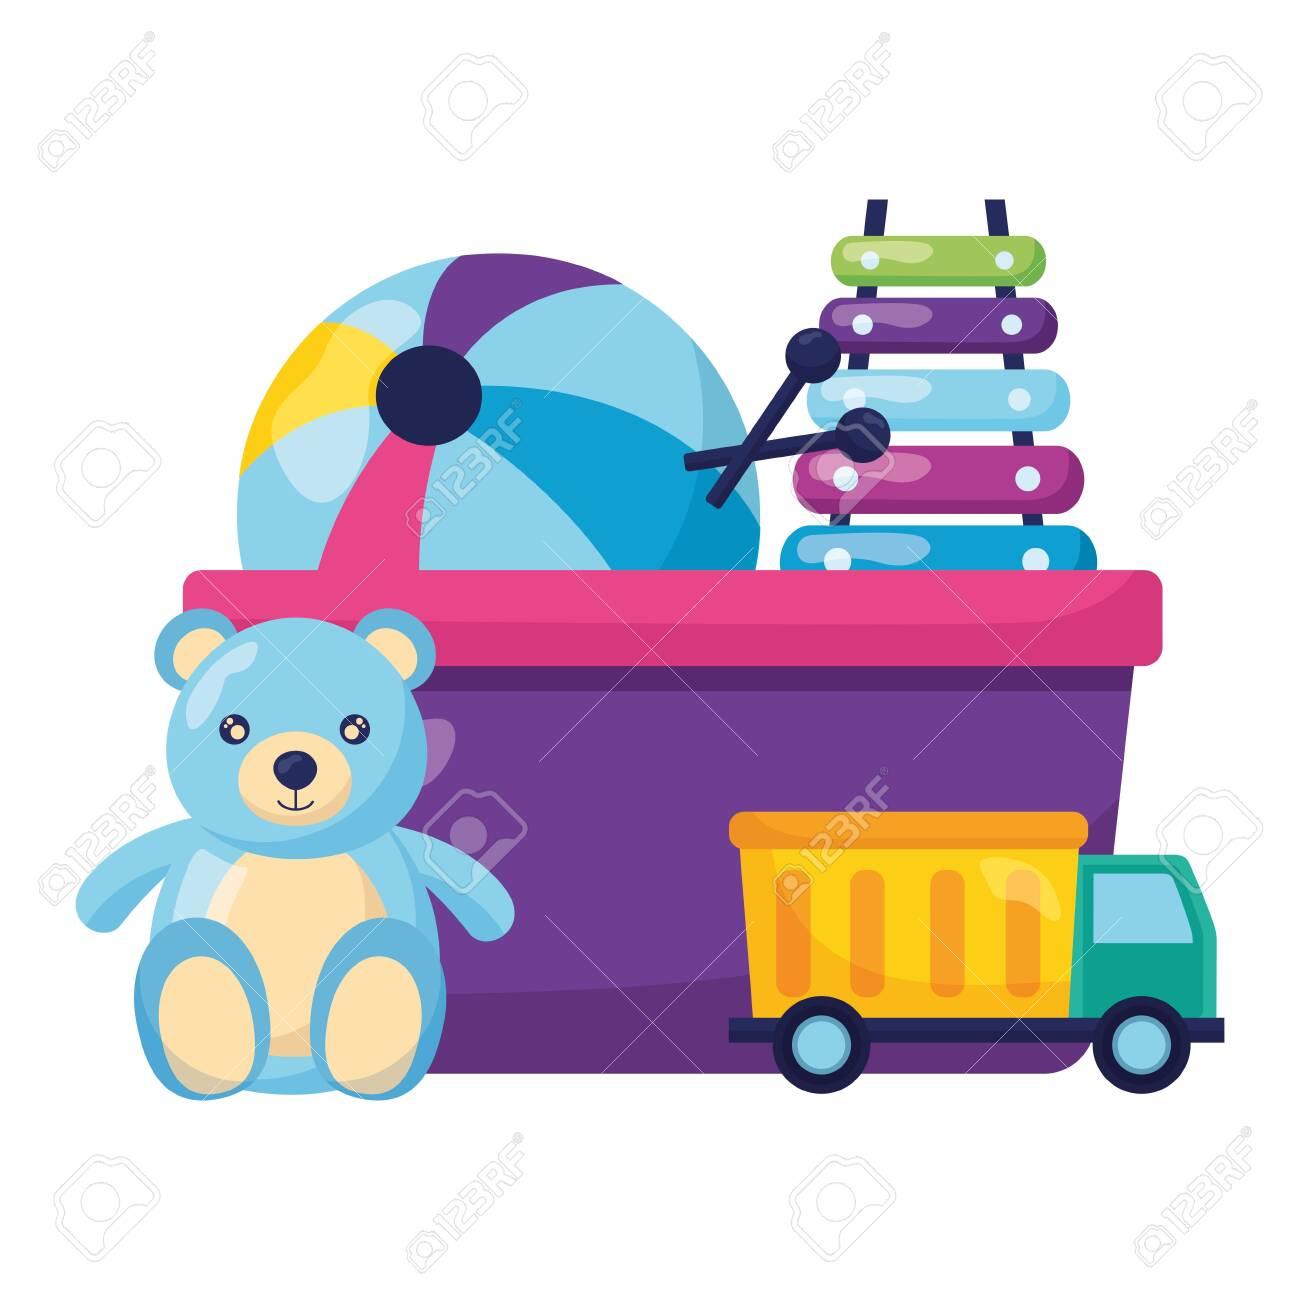 bear xylophone truck ball kids toys vector illustration - 152559111